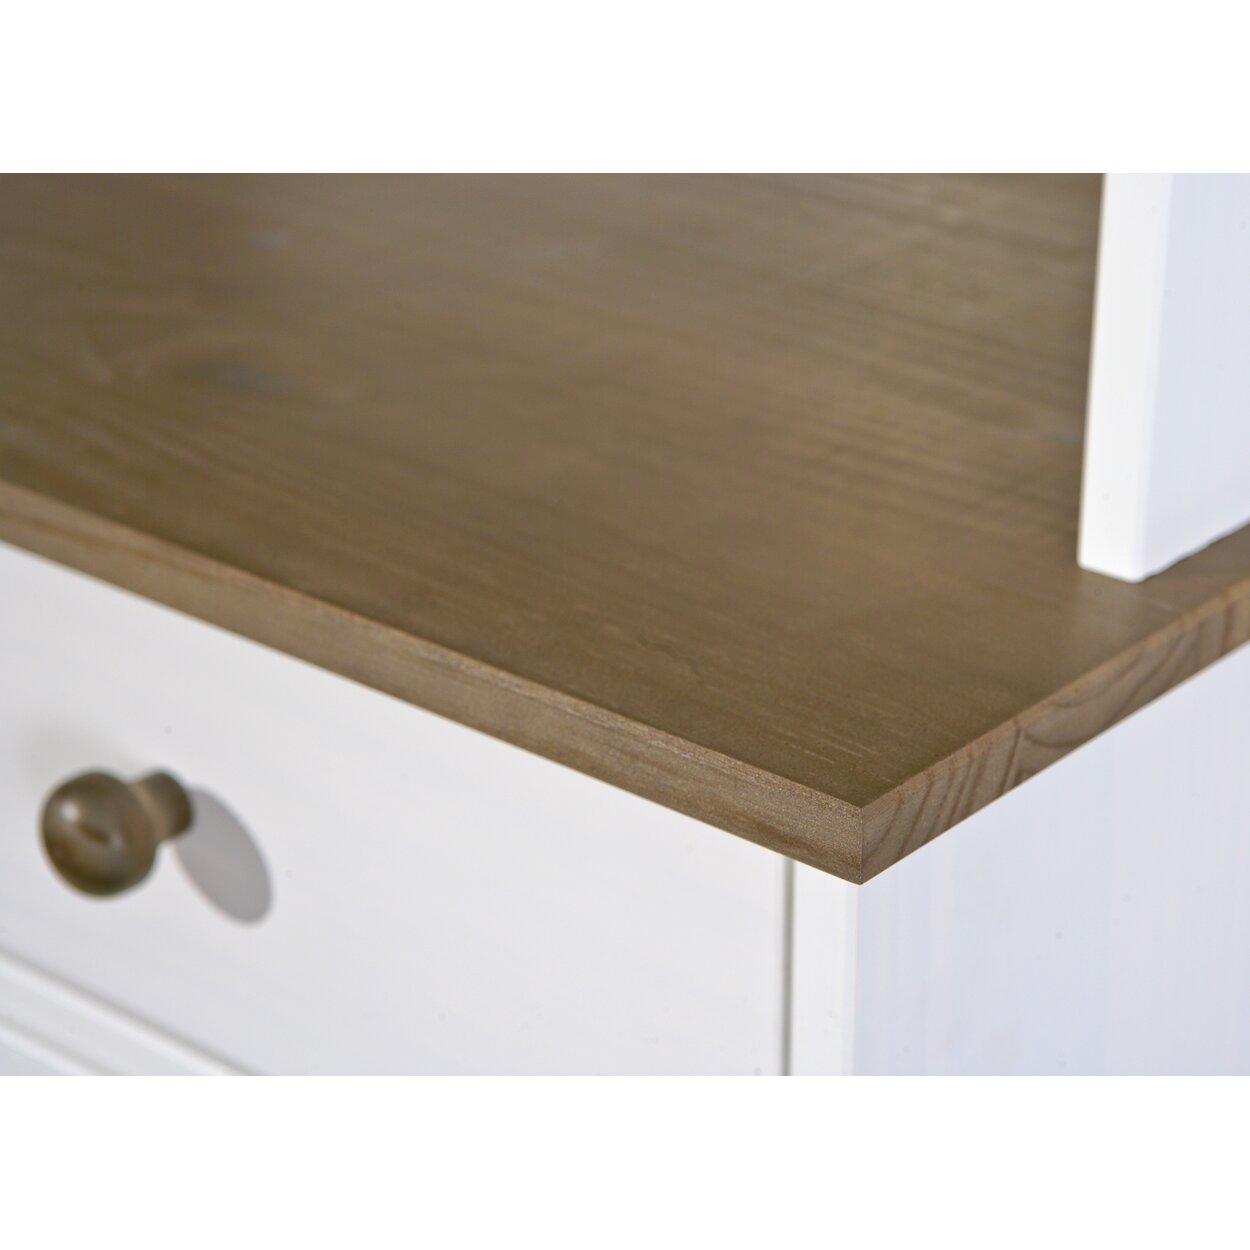 interlink buffetschrank aus massivholz bewertungen. Black Bedroom Furniture Sets. Home Design Ideas